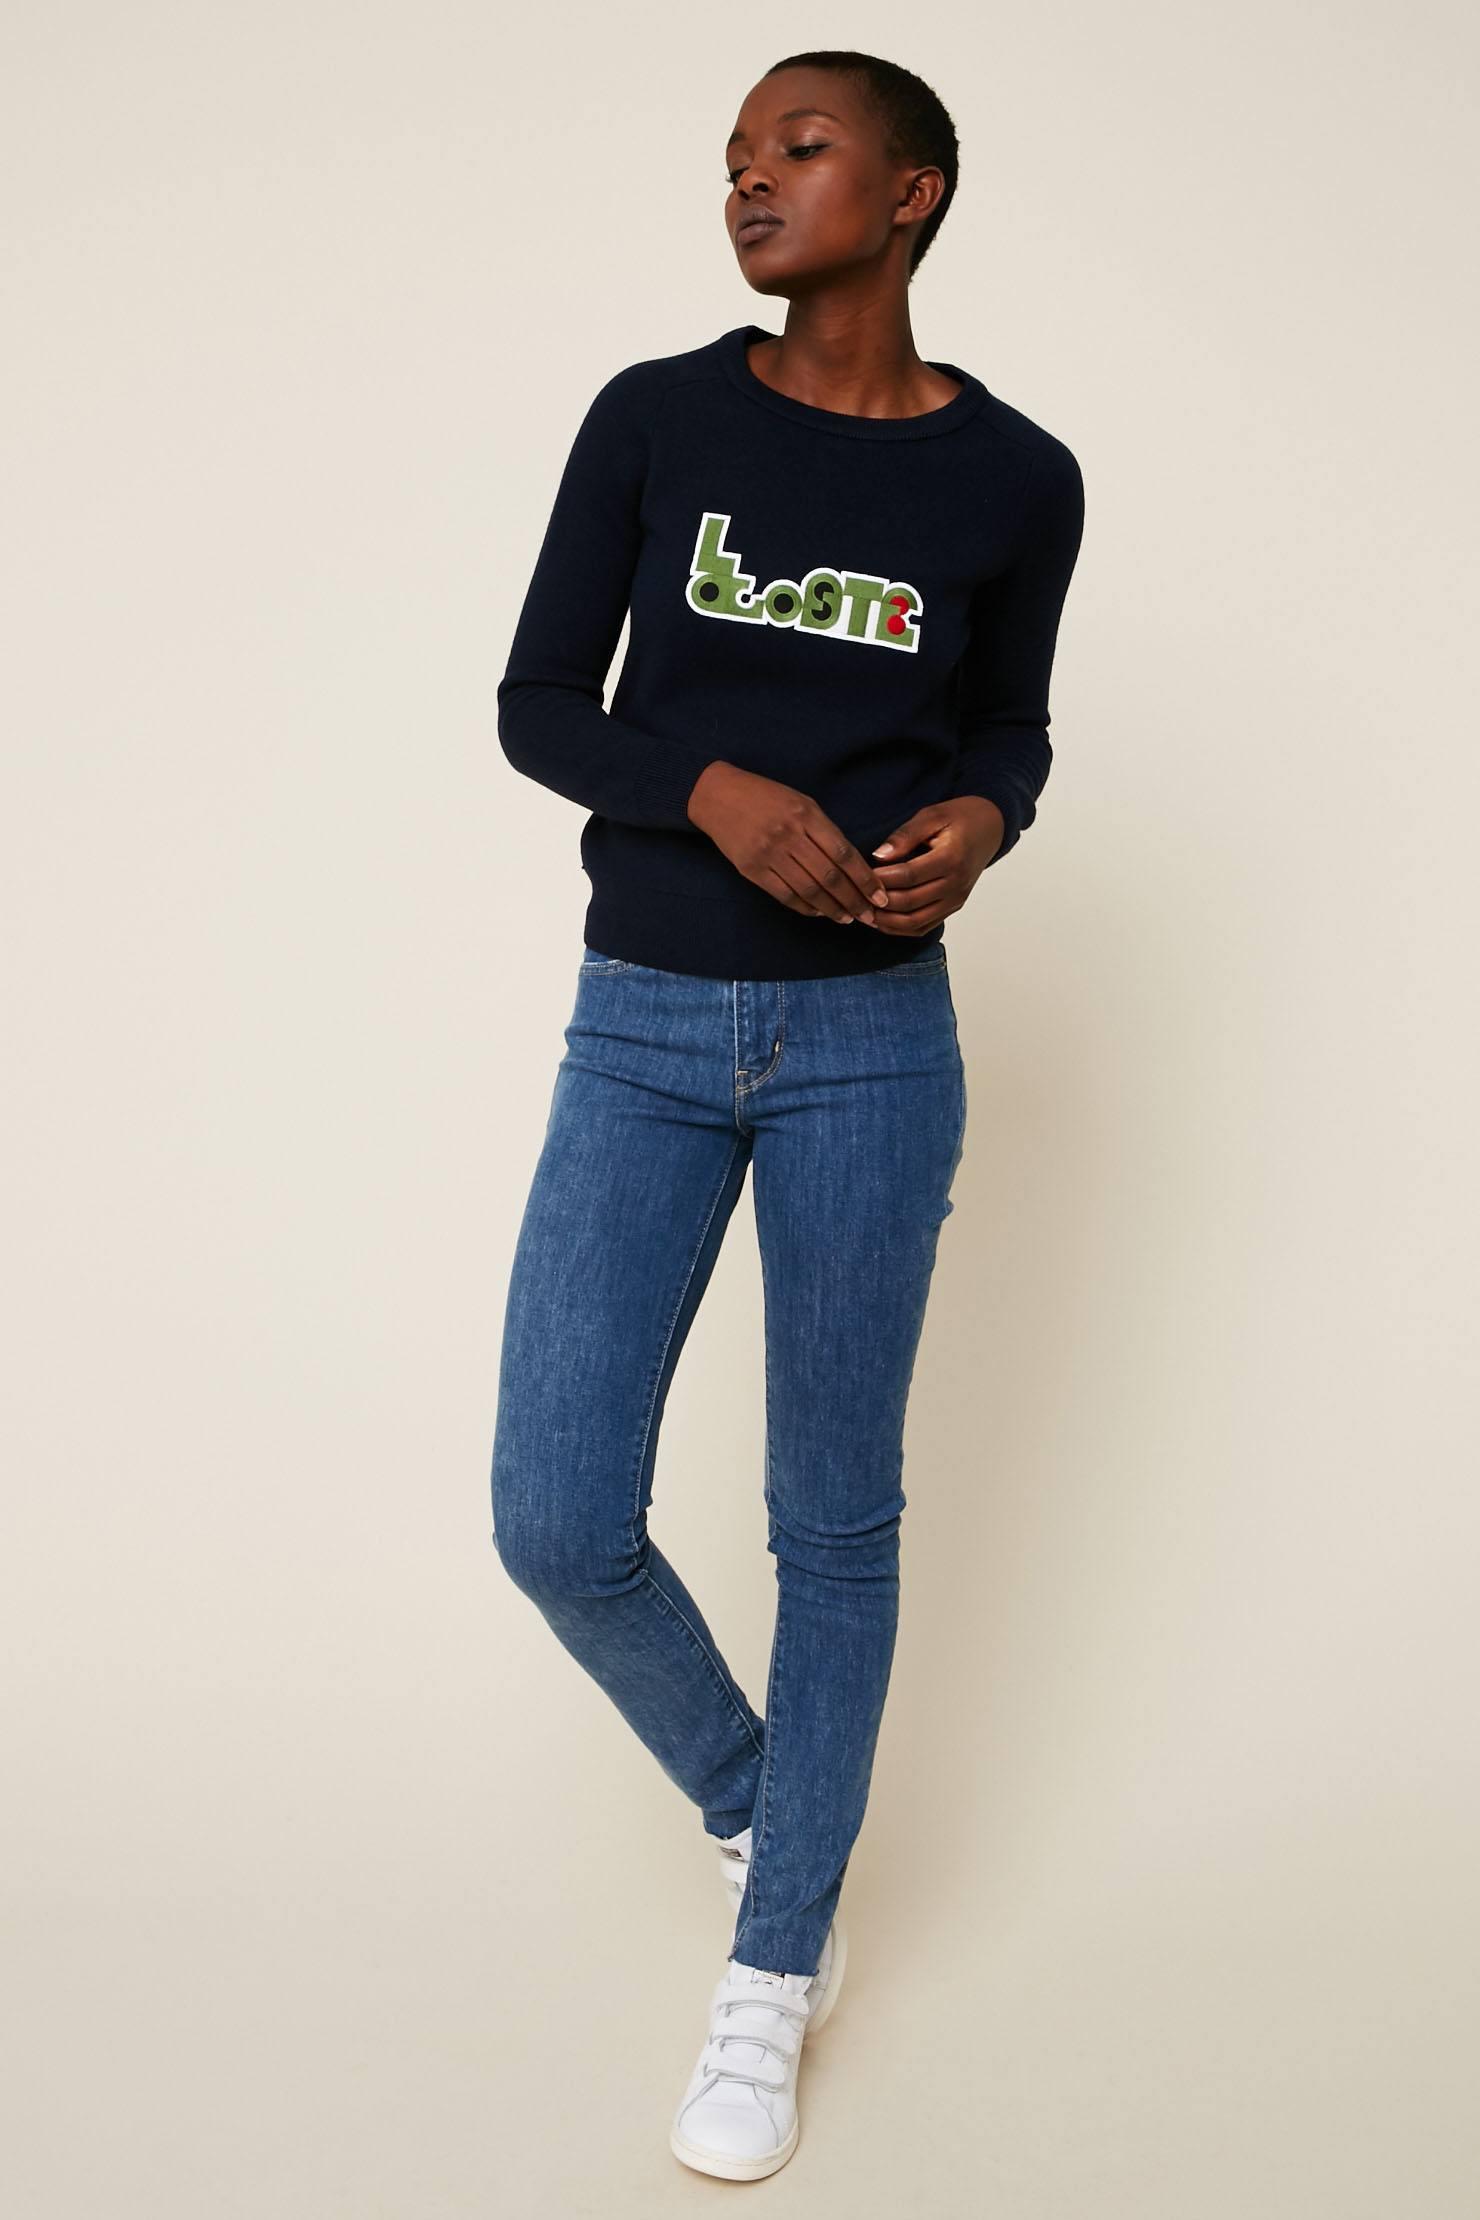 Lacoste Pull en laine marine brodé logo marque - Monshowroom